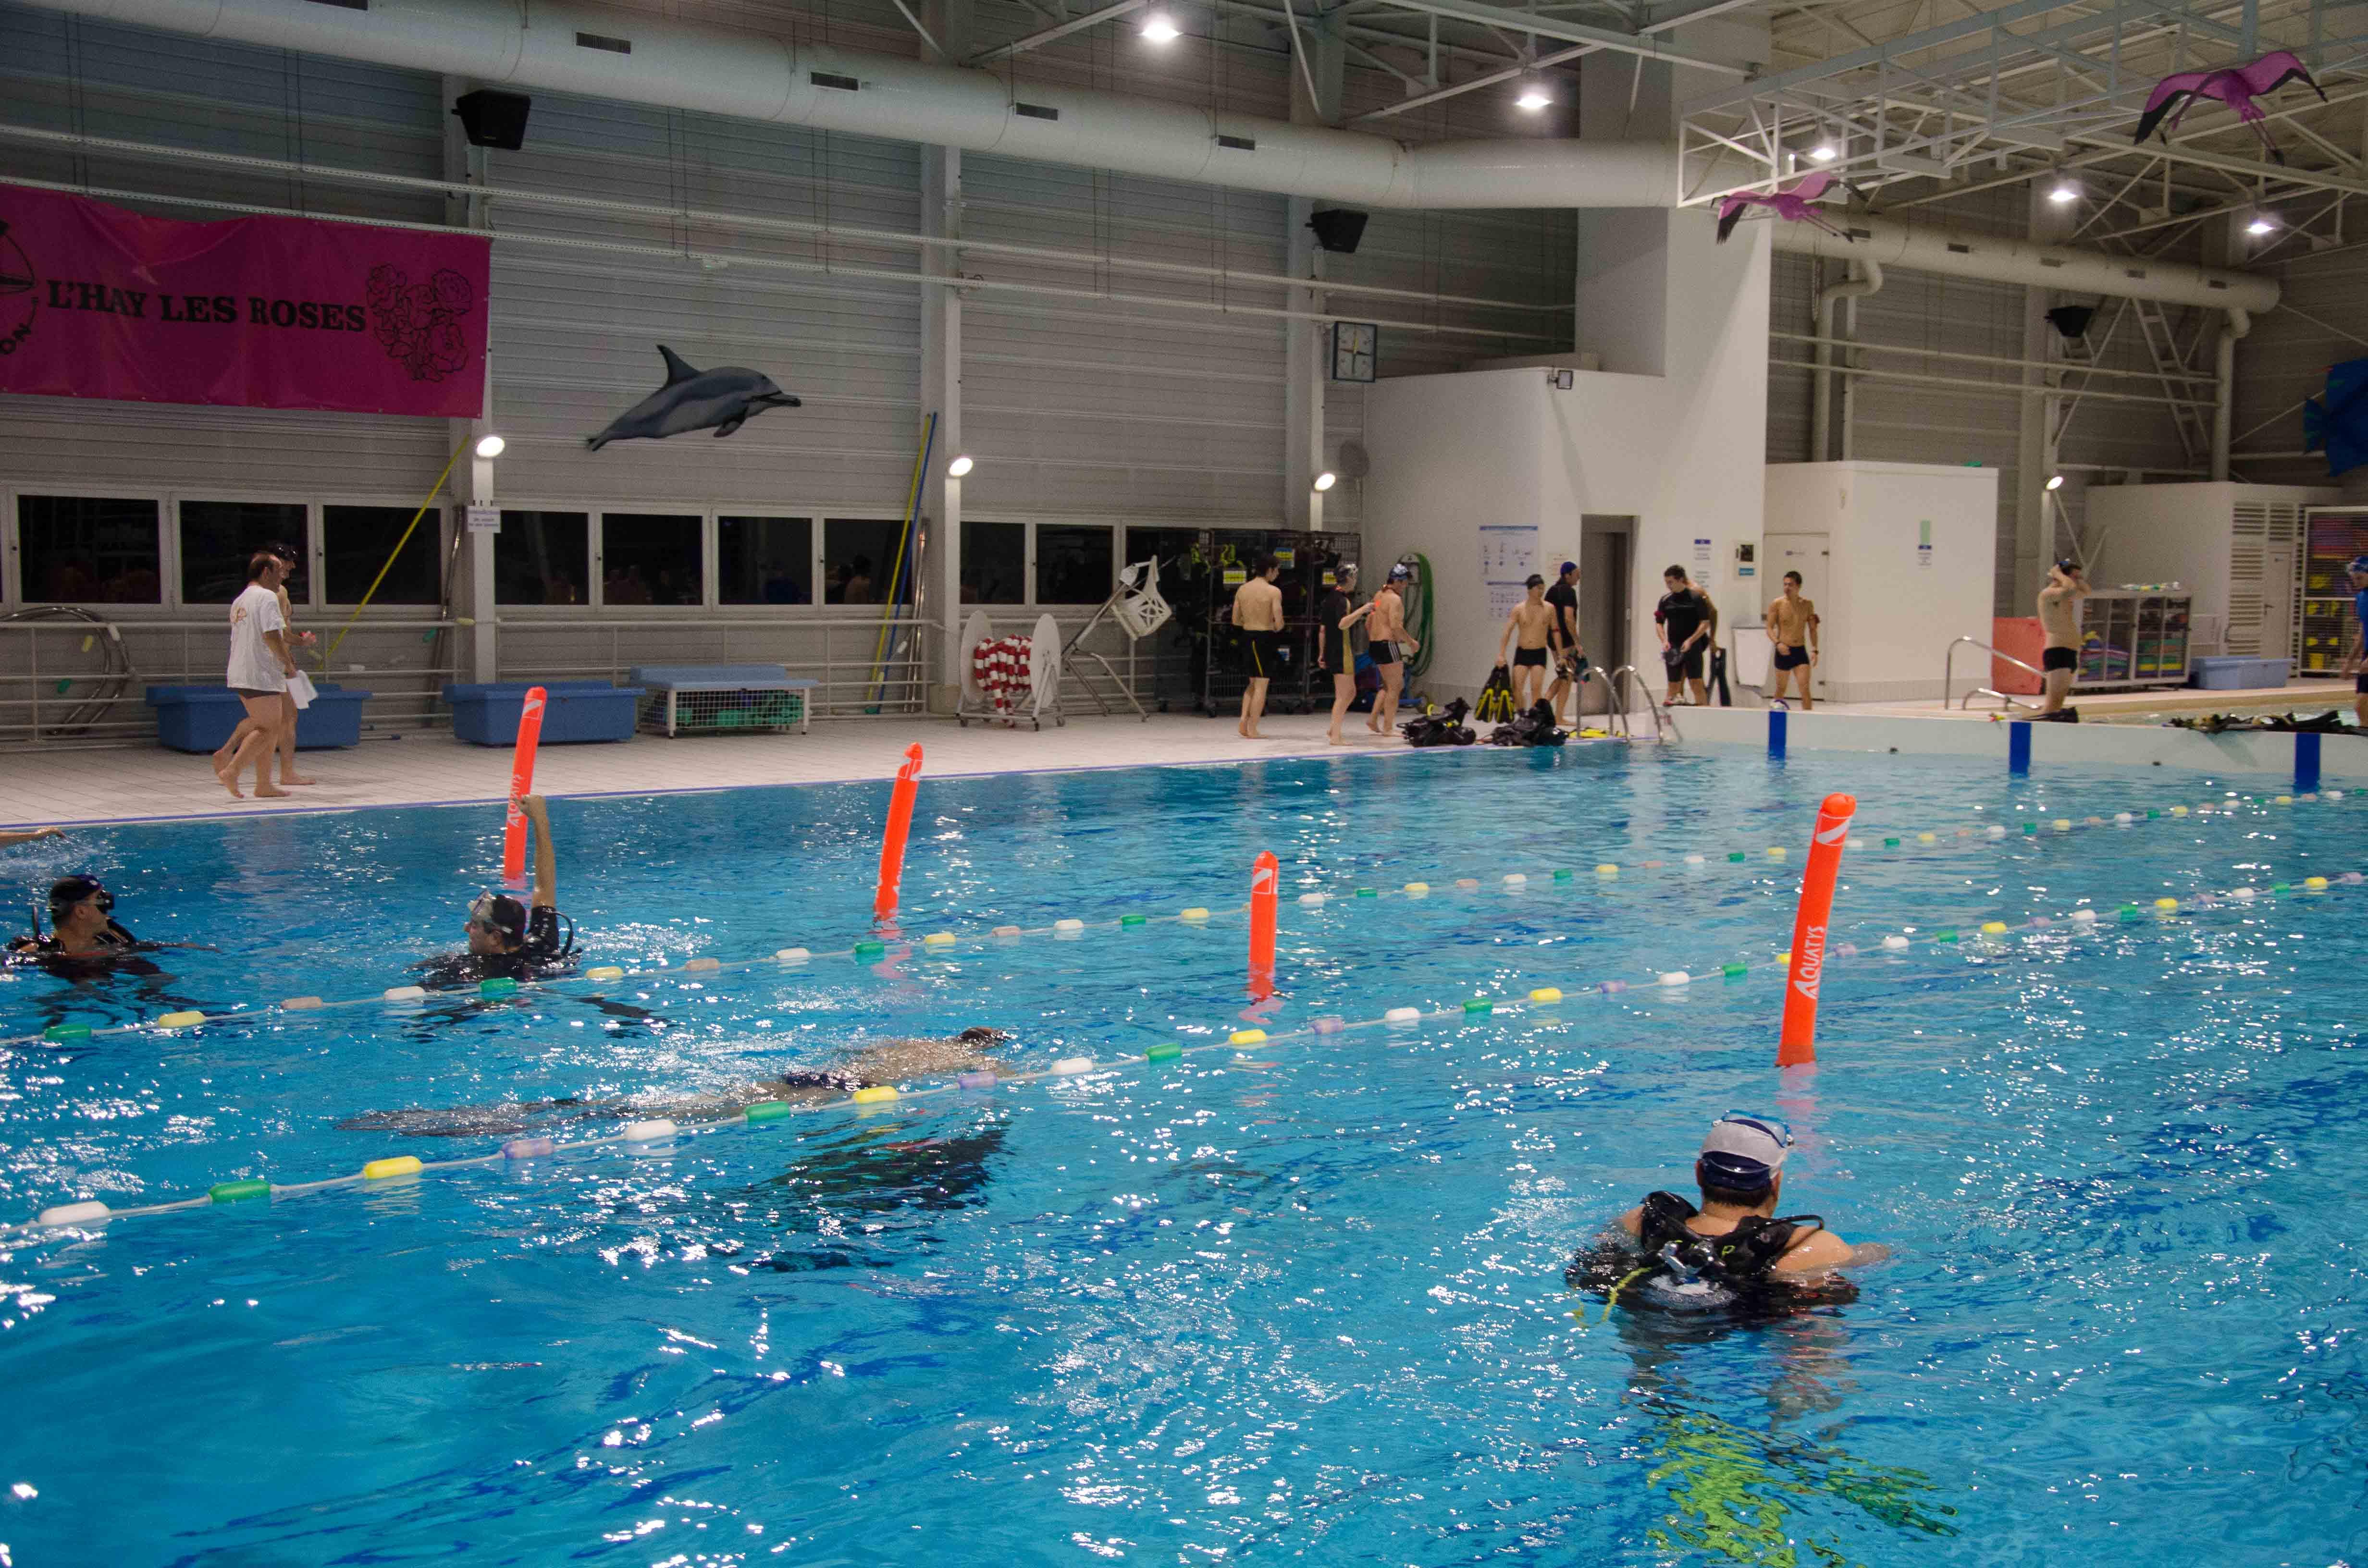 Challenge calpien 2016 club de plong e sous marine de l for Club piscine repentigny noel